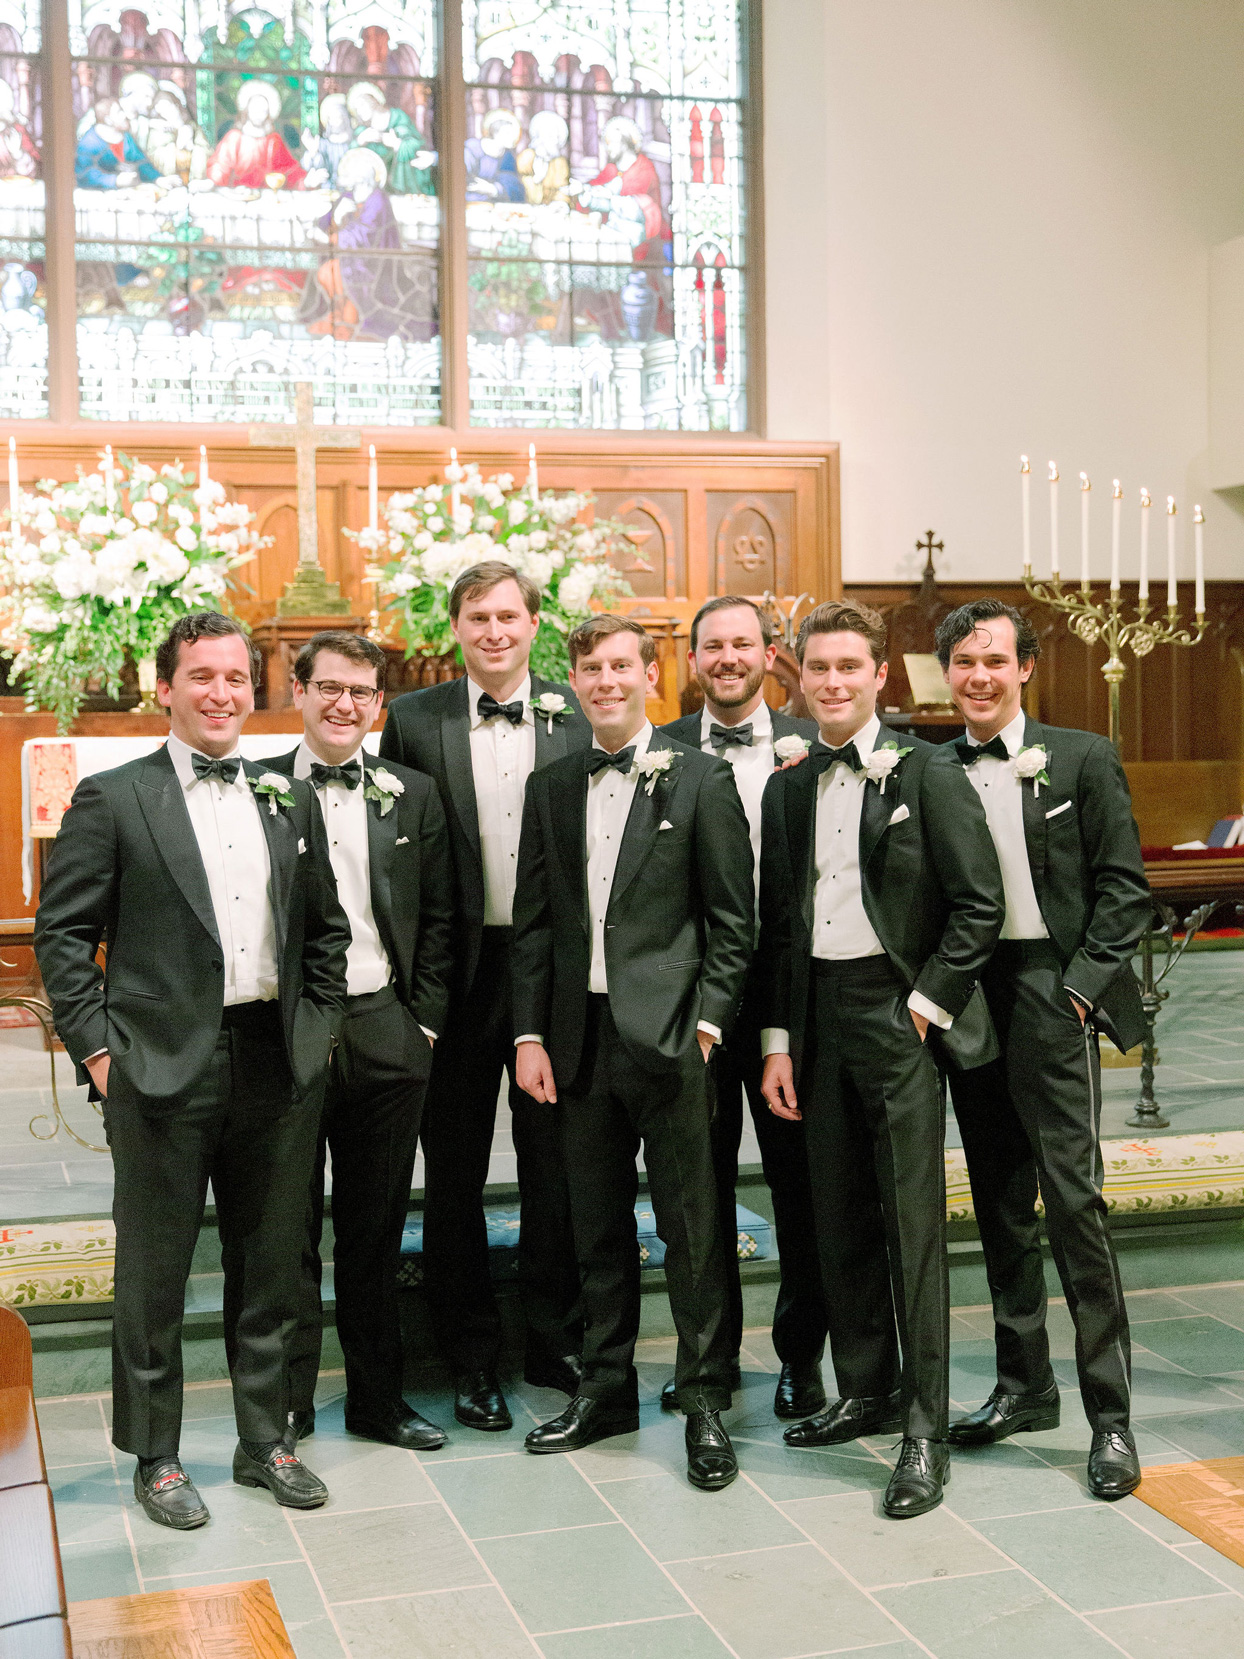 groom with groomsmen in classic black suits